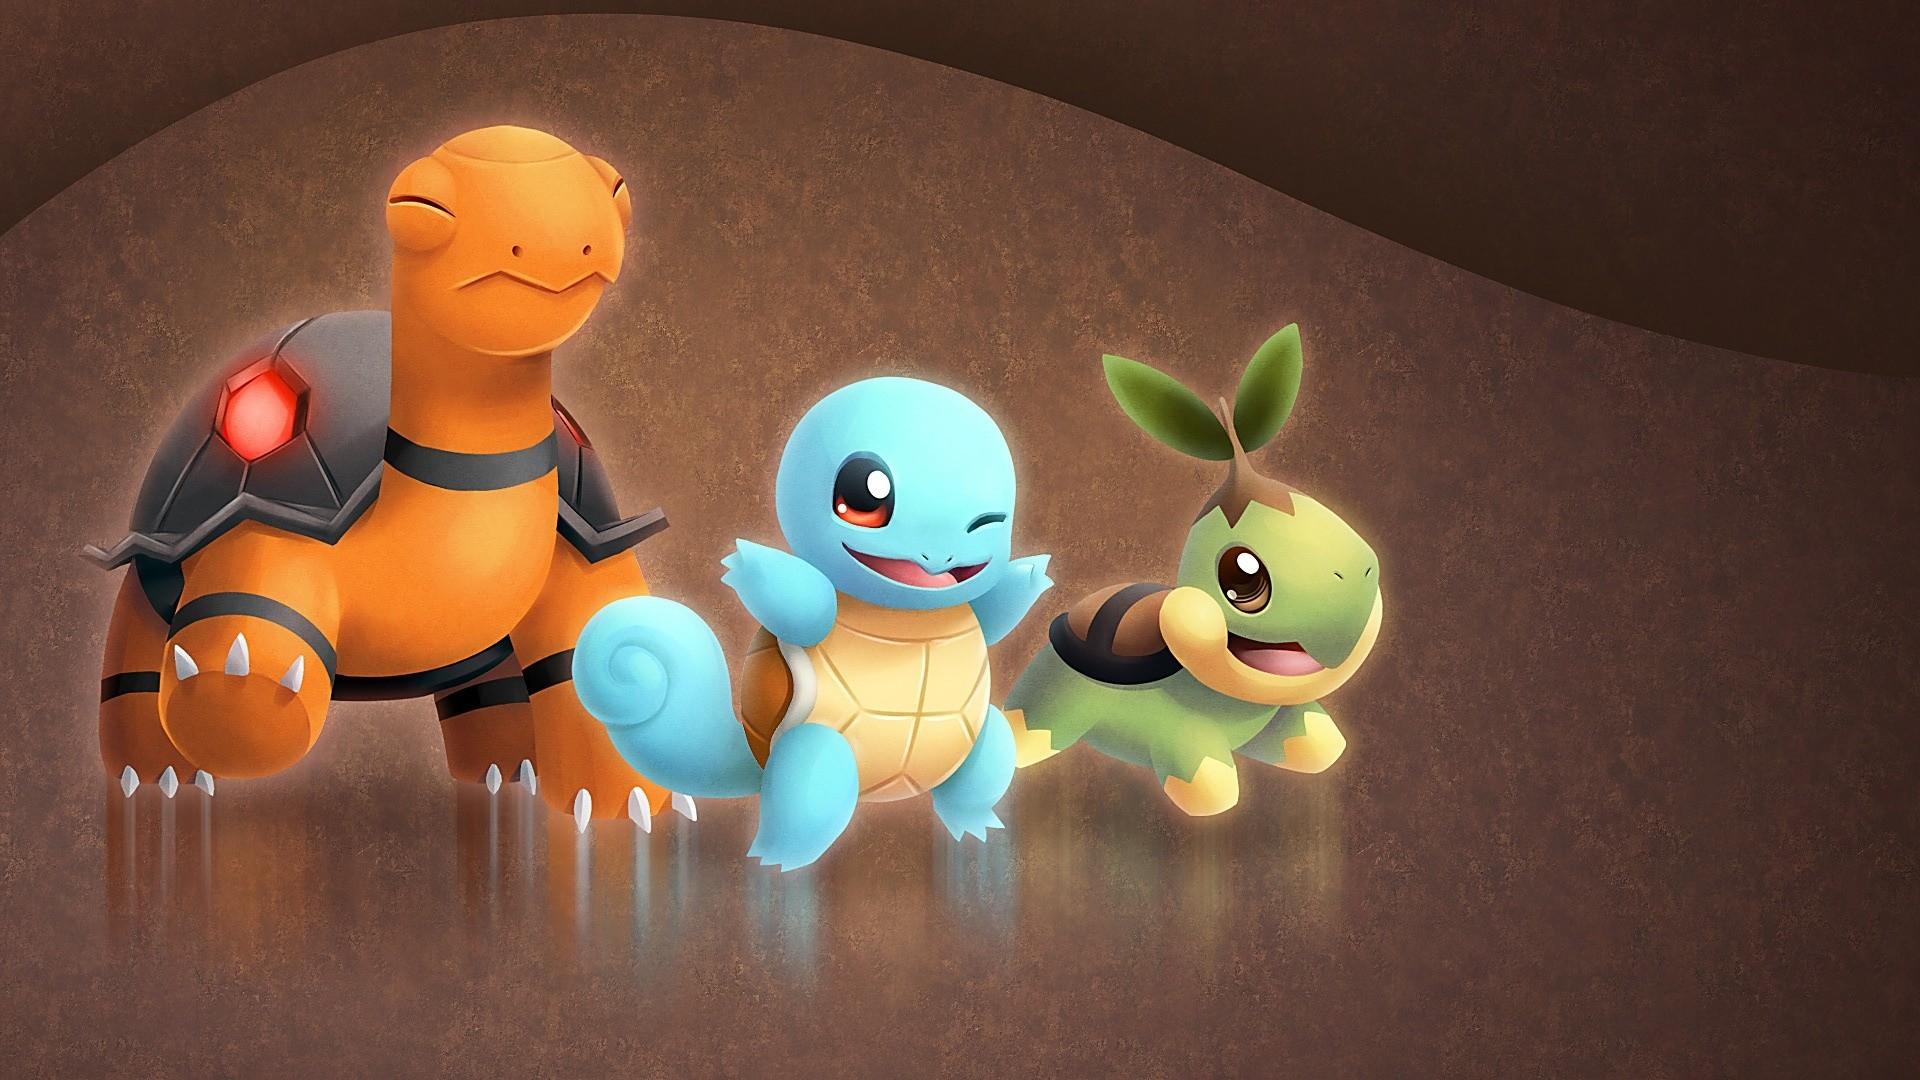 Cute Pokemon HD Wallpaper Download Free.